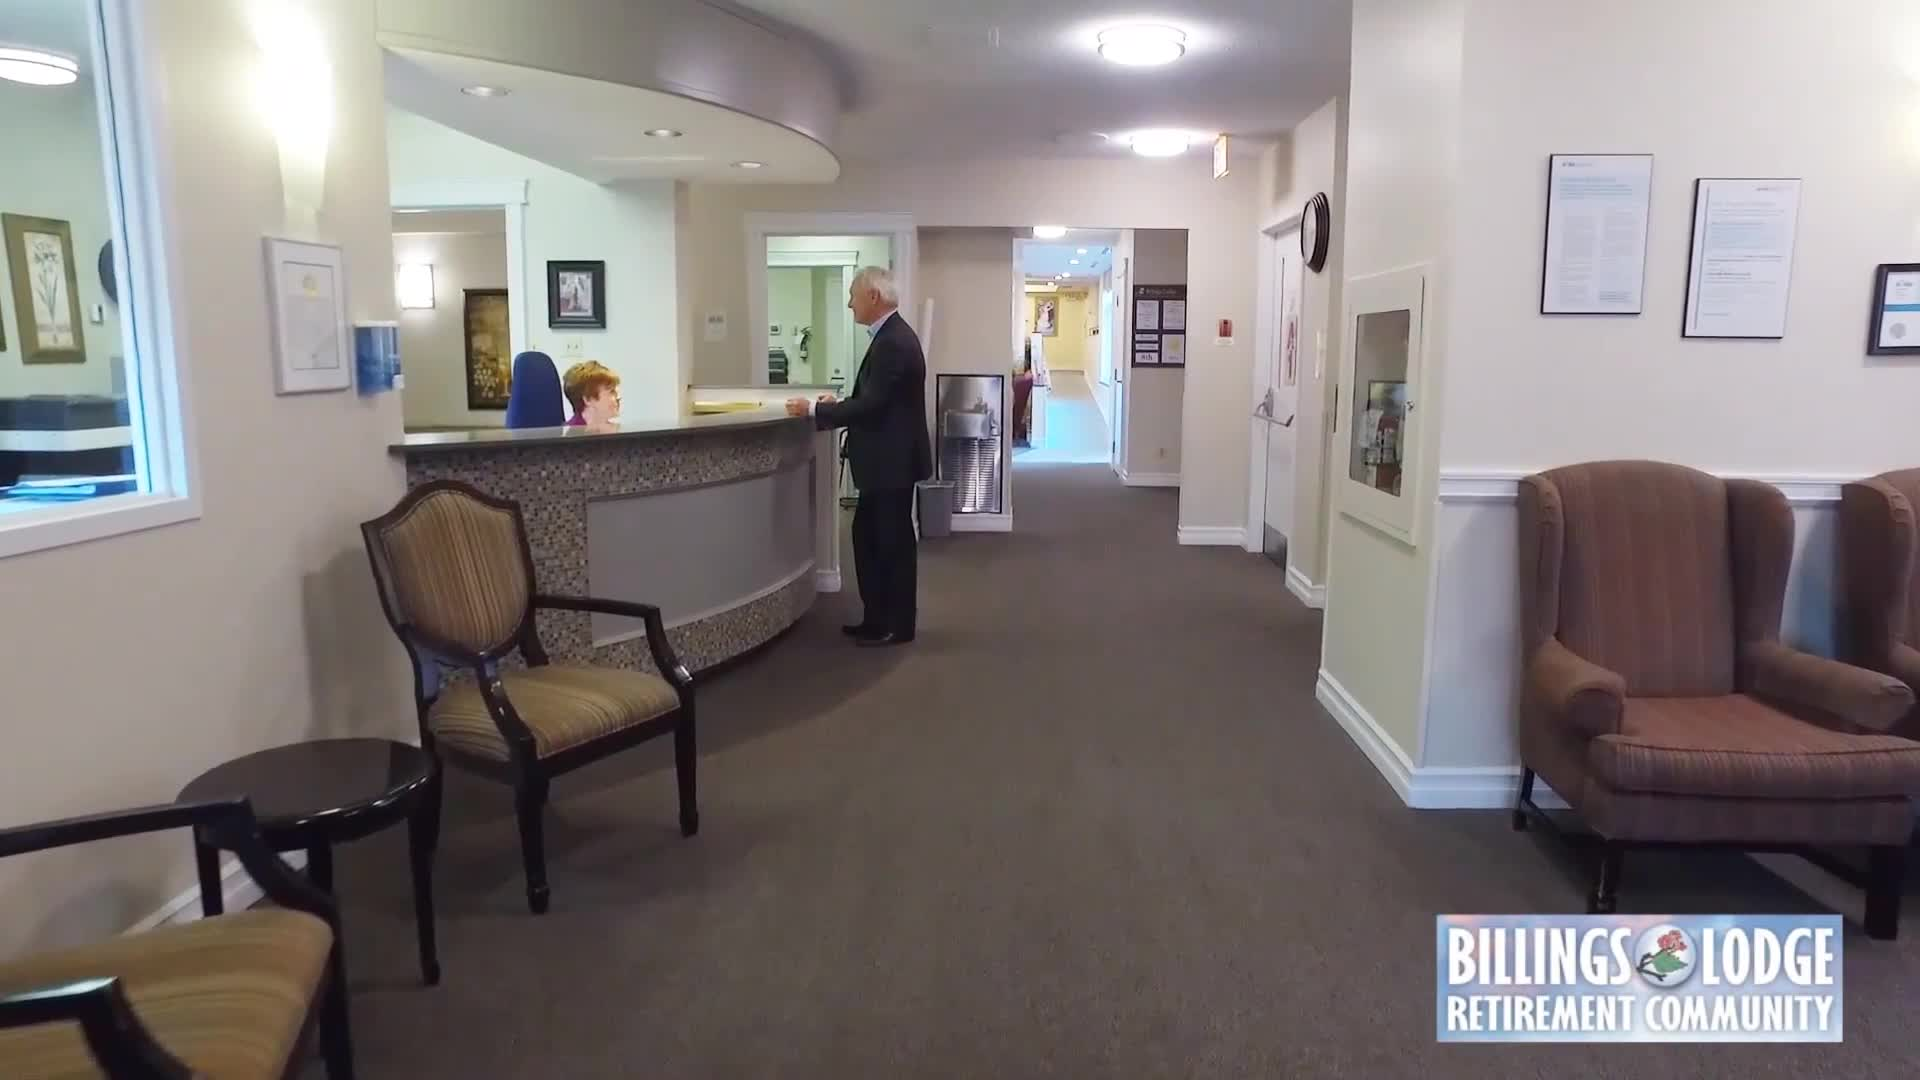 Billings Lodge - Retirement Homes & Communities - 613-737-7877